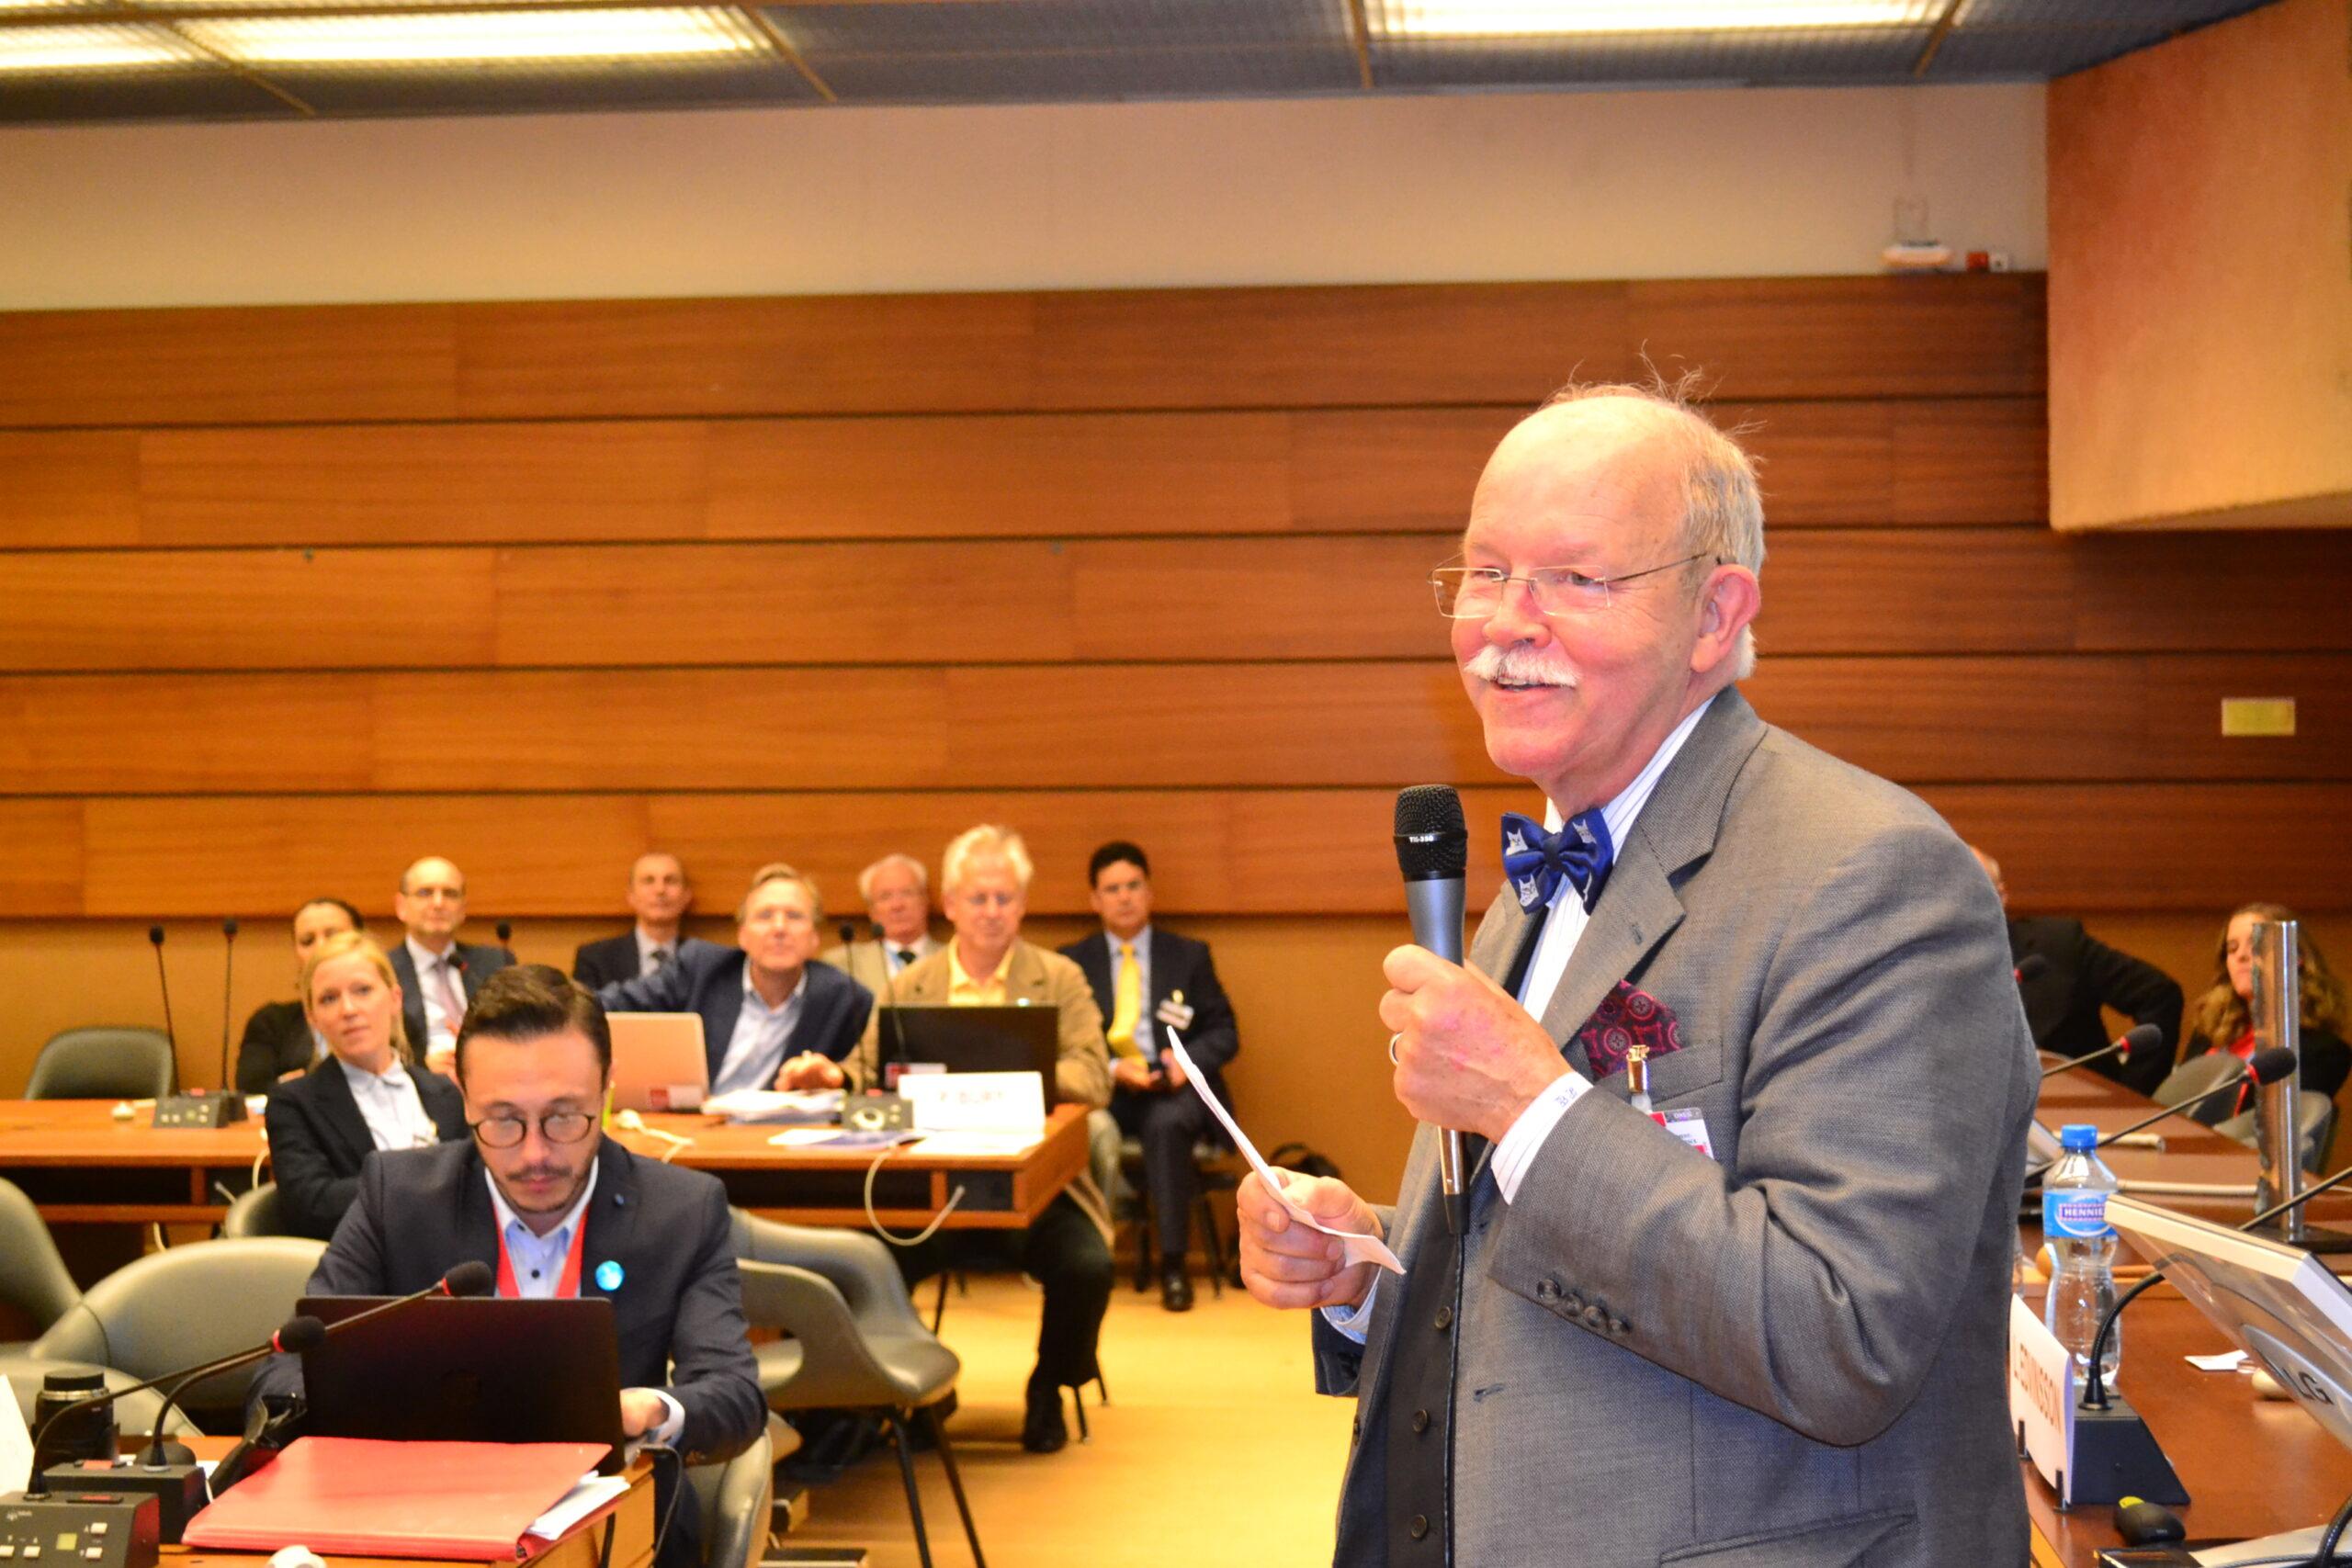 K4D Global Partnership Conference 2017 - Day 1